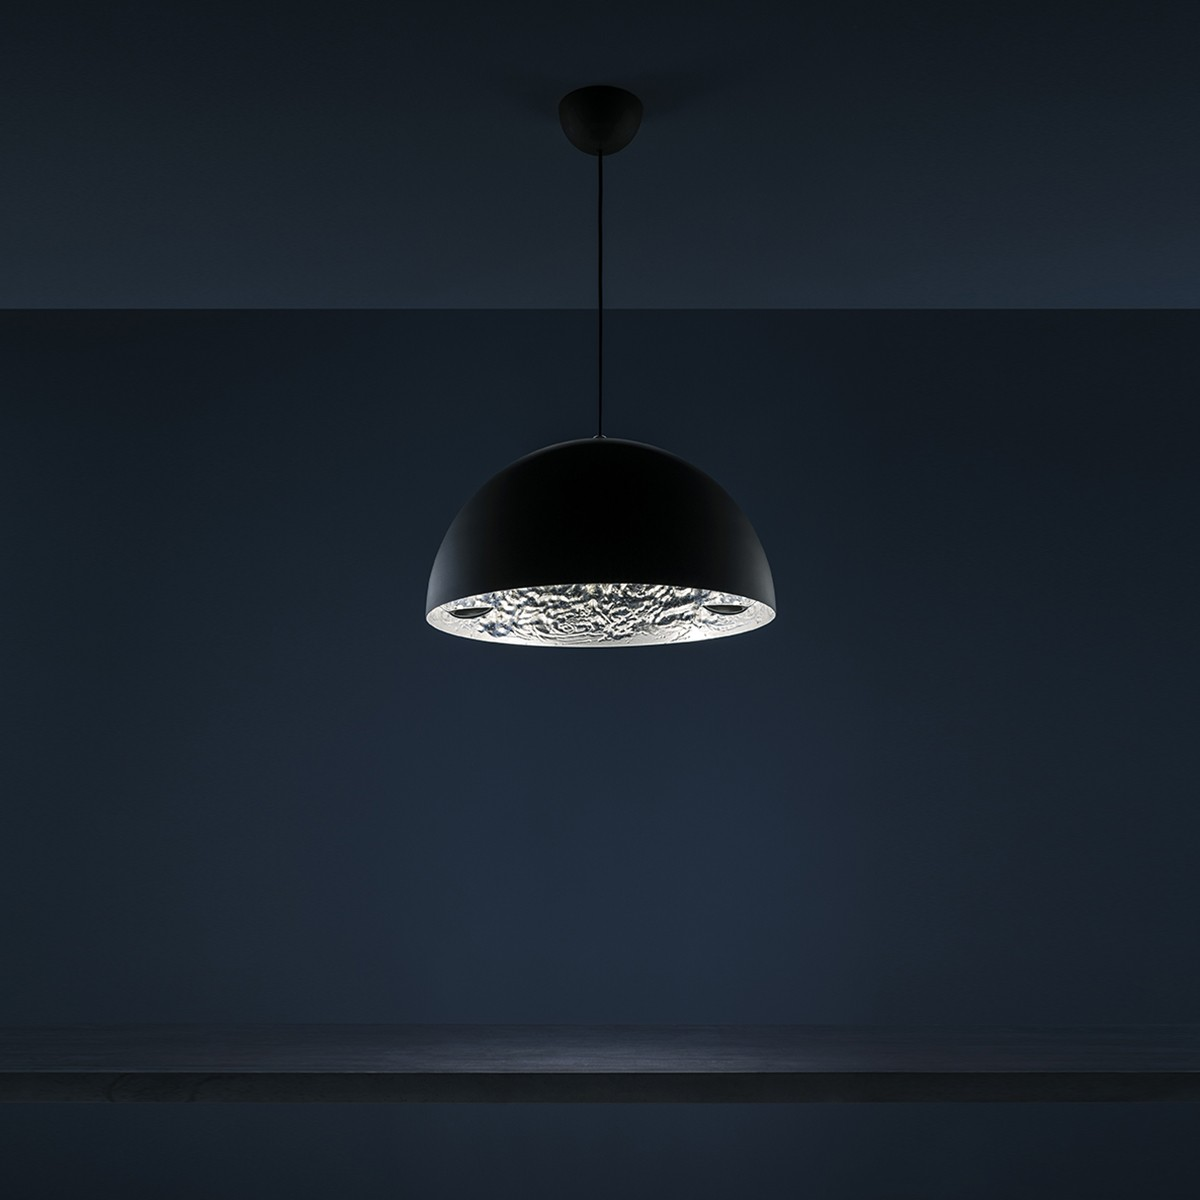 Catellani & Smith Stchu-Moon 02 LED Pendelleuchte, Ø: 40 cm, schwarz / Silber